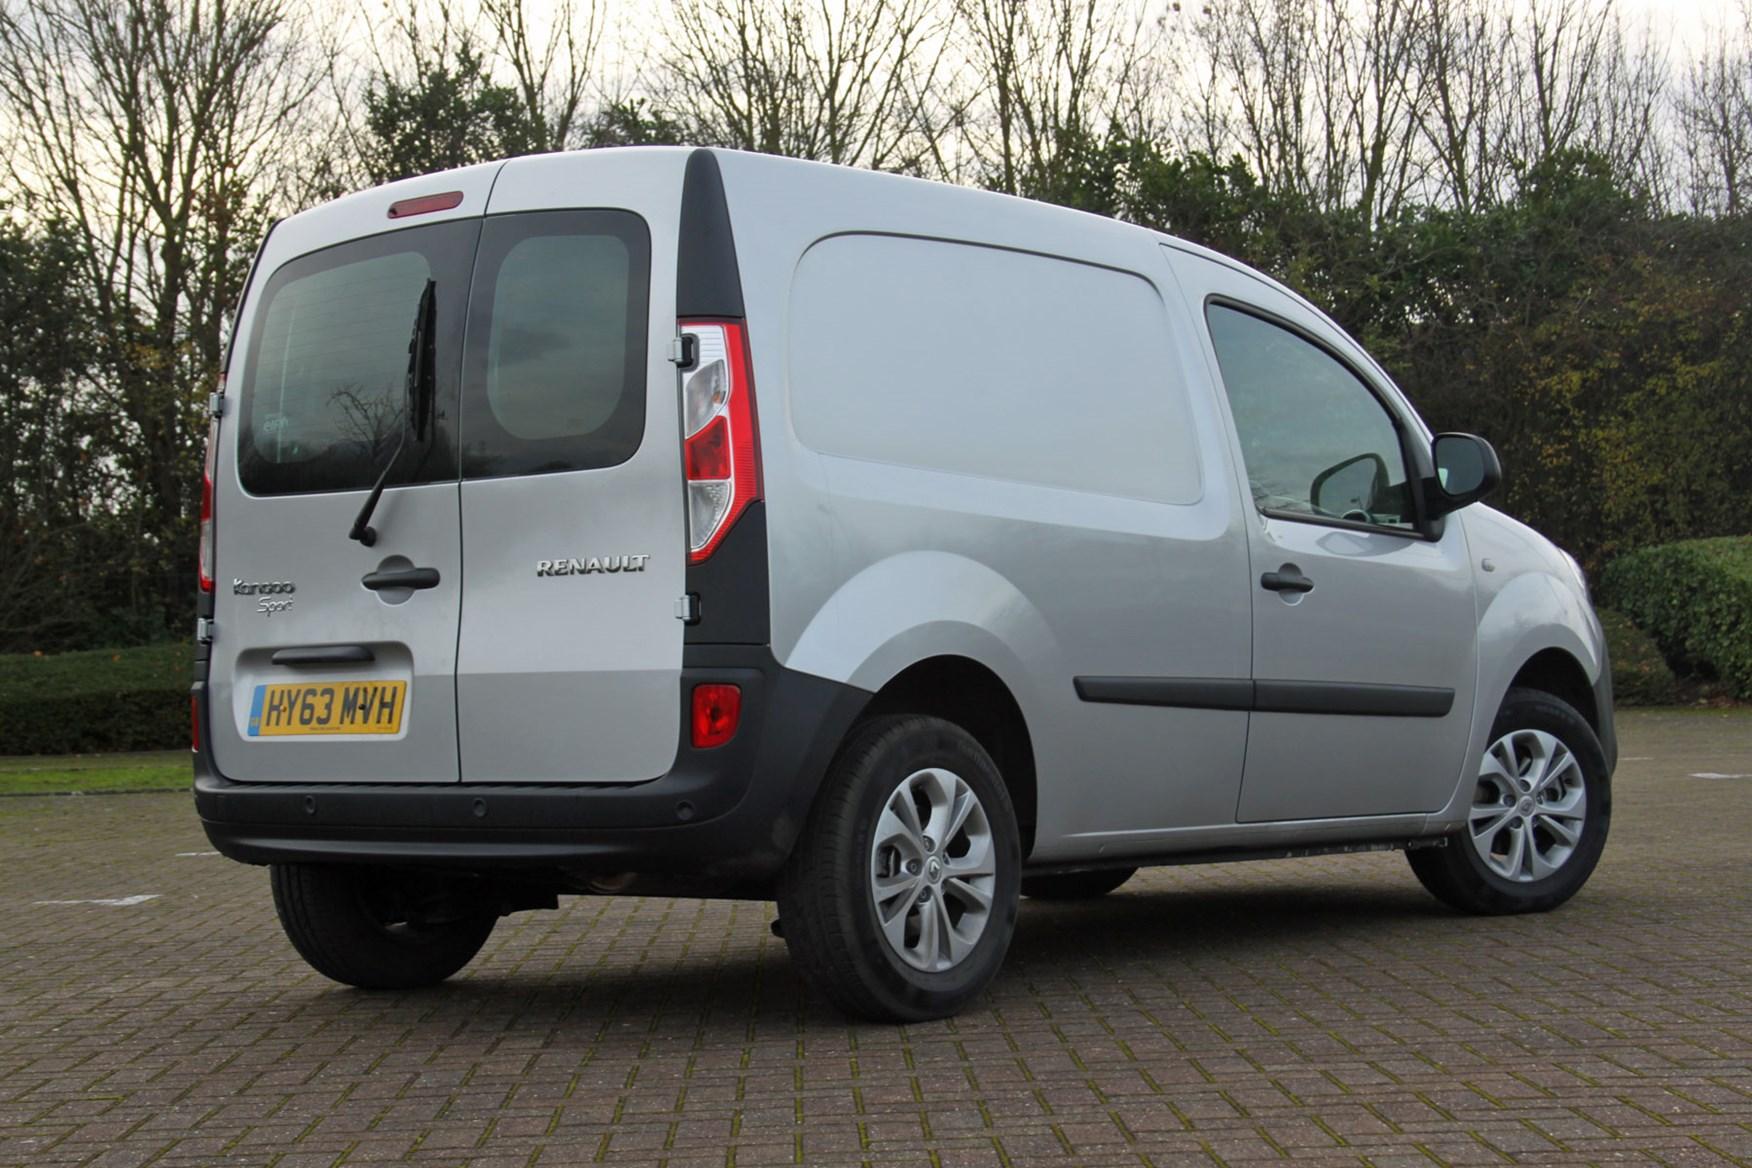 Renault Kangoo Sport review - rear view, silver